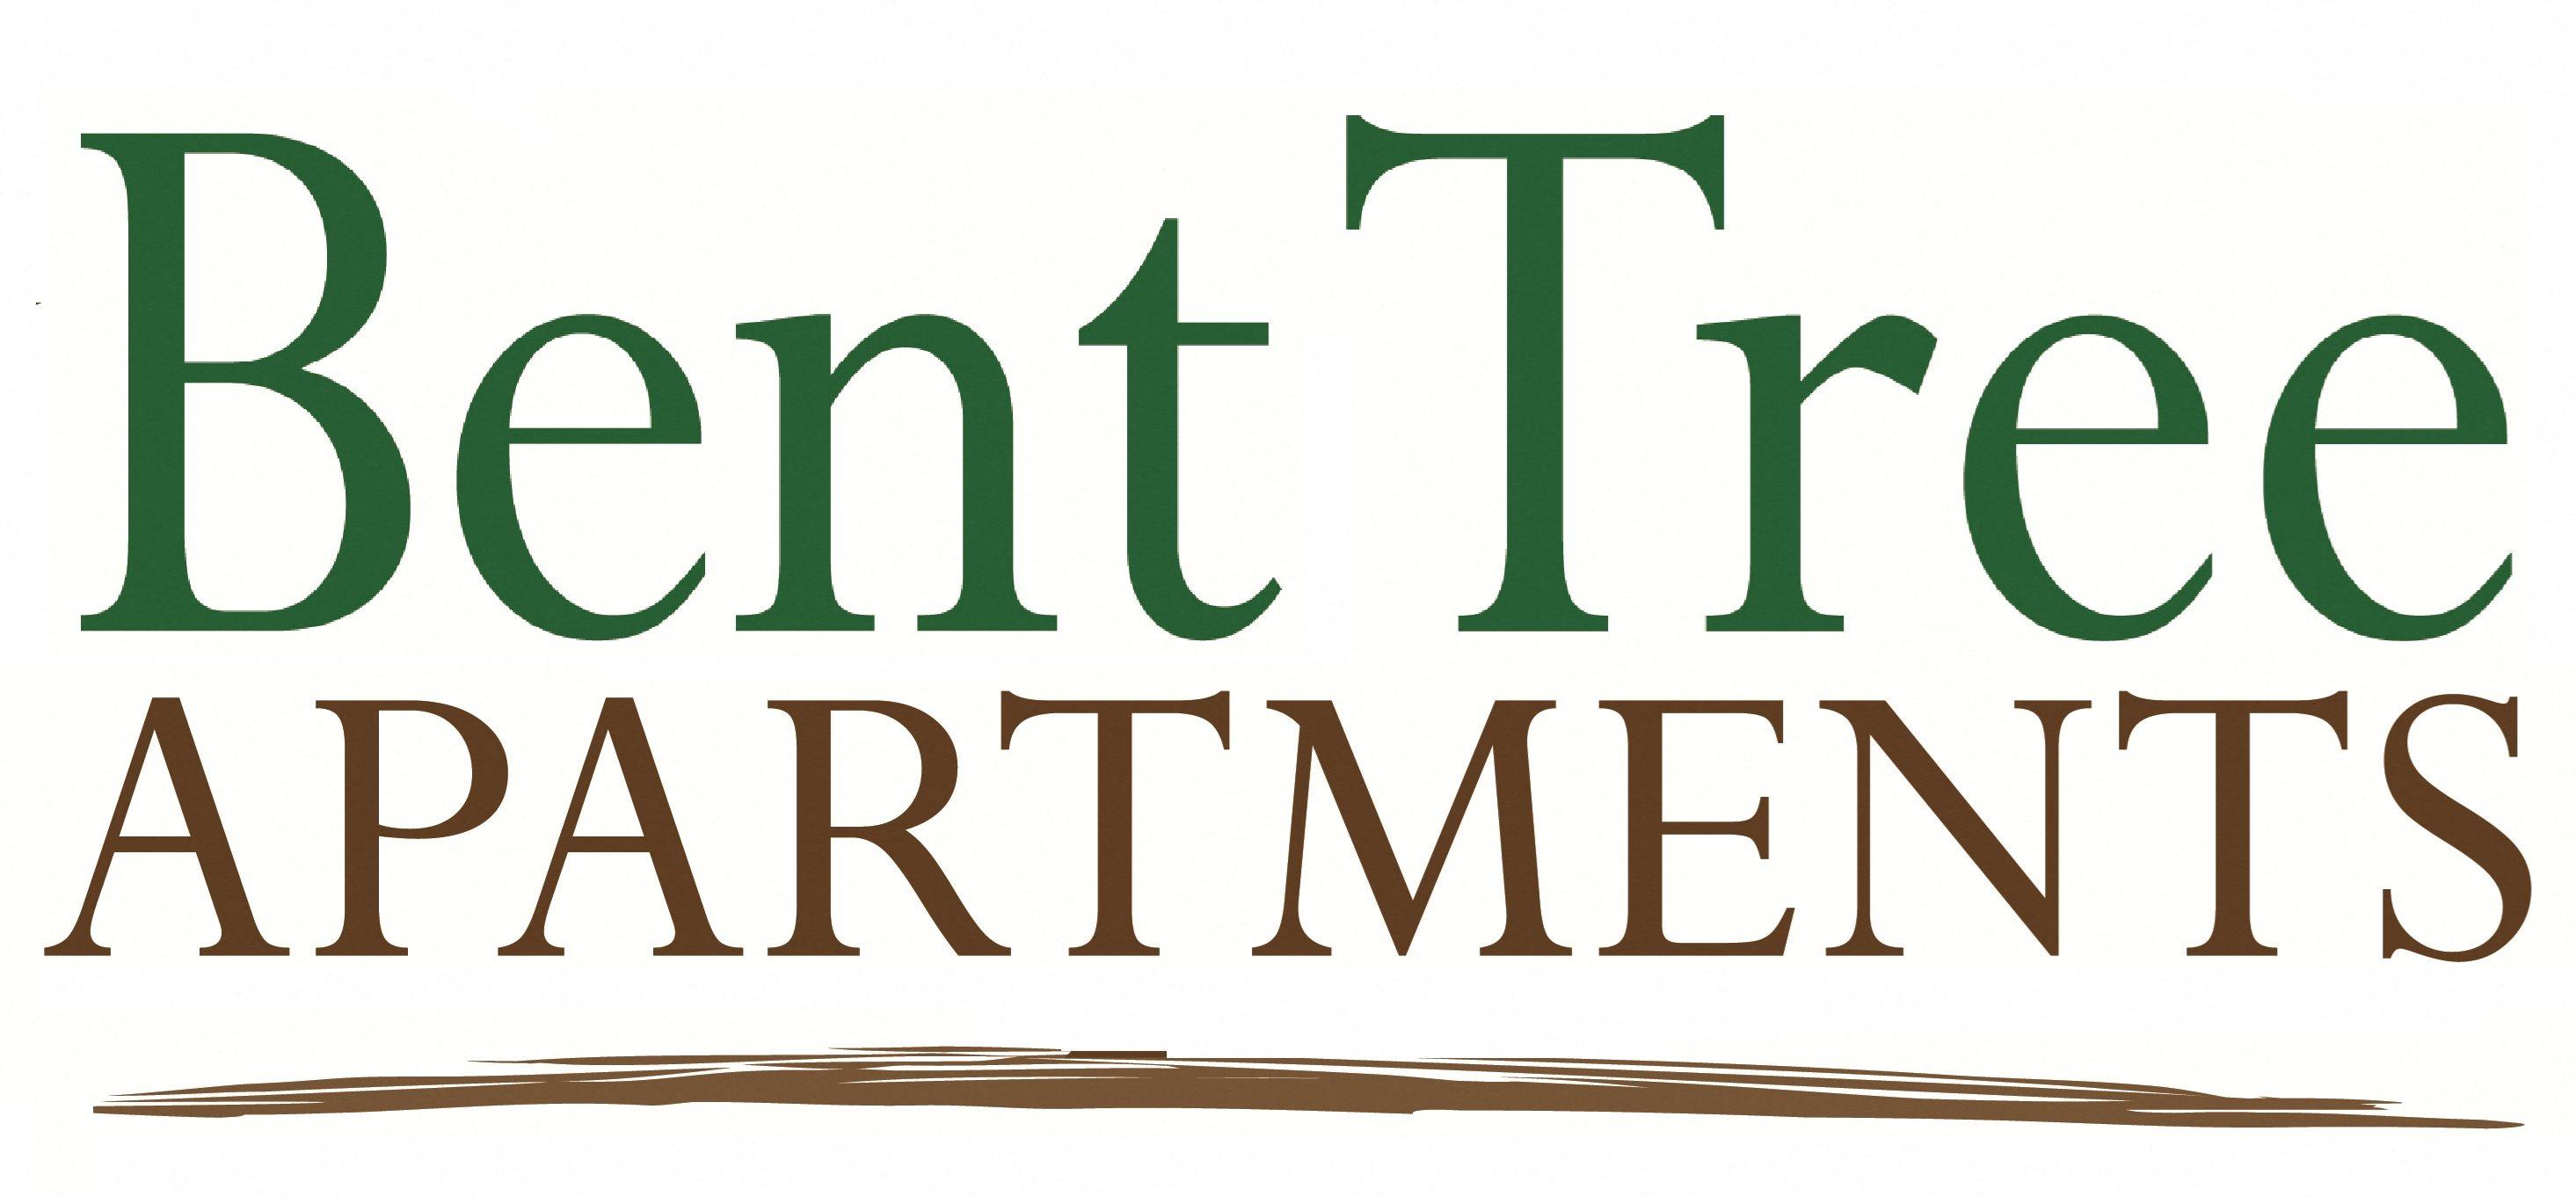 Port Arthur Property Logo 0